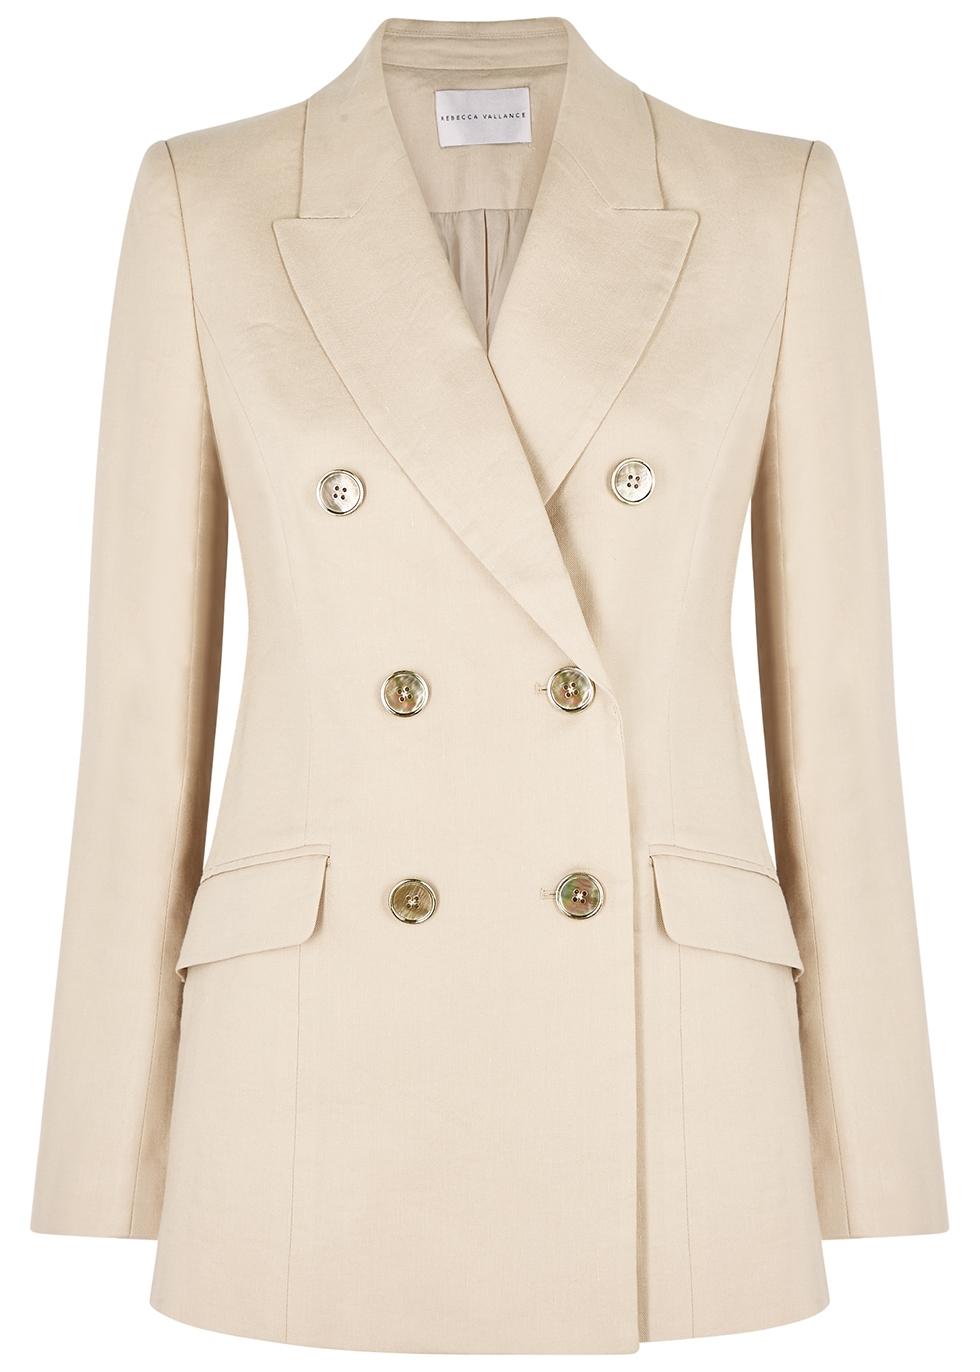 Mojito ecru linen-blend blazer